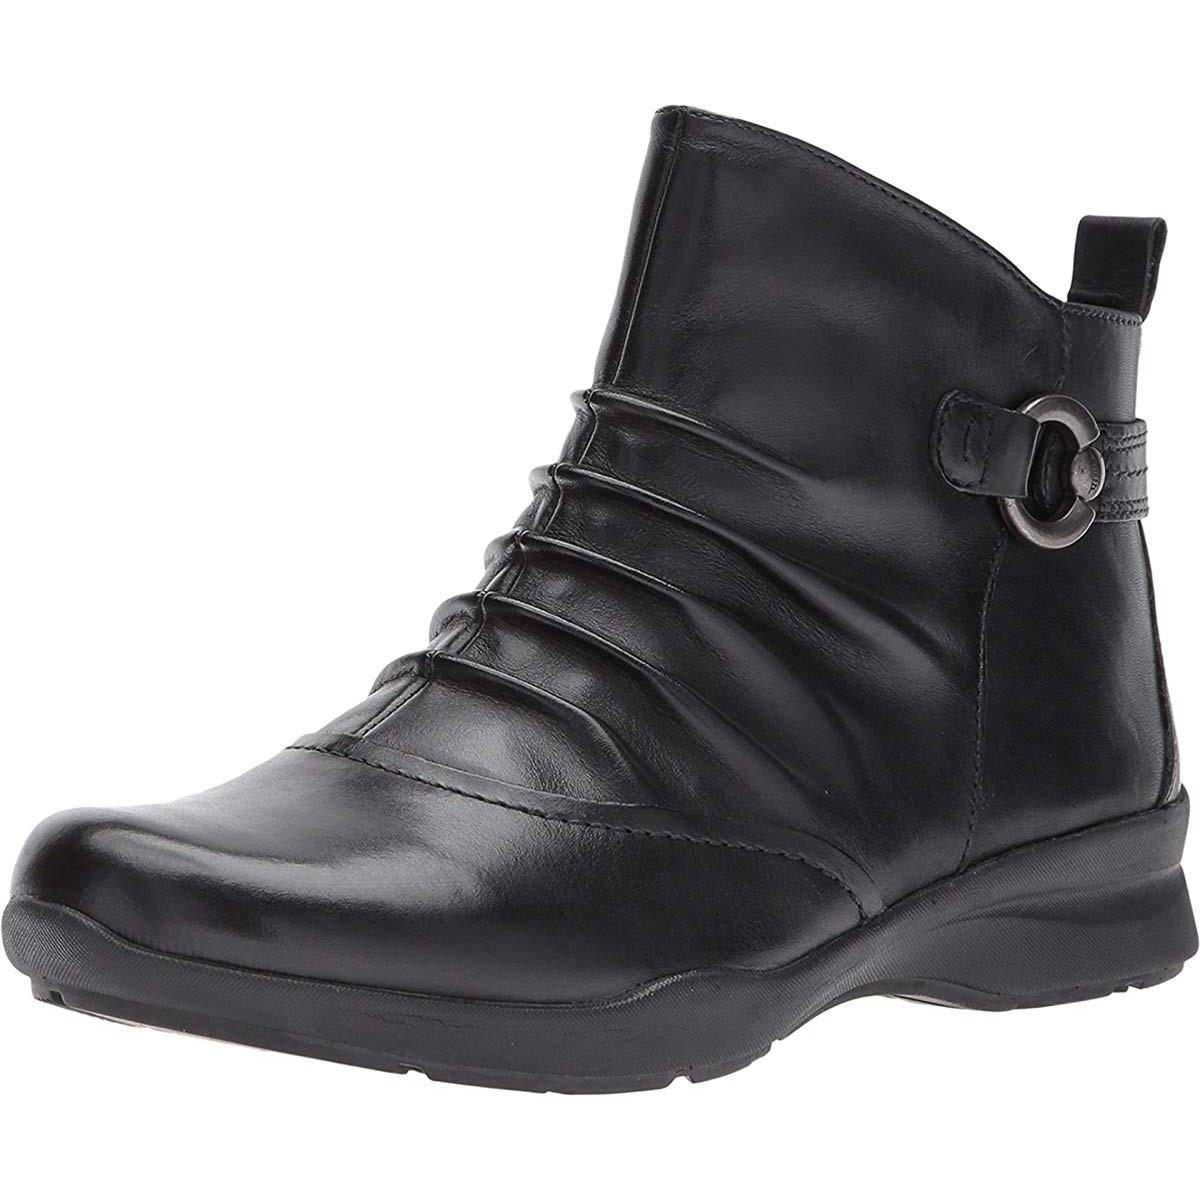 Ботинки Earth Alta Black Full Grain Leather - Оригинал, фото 1